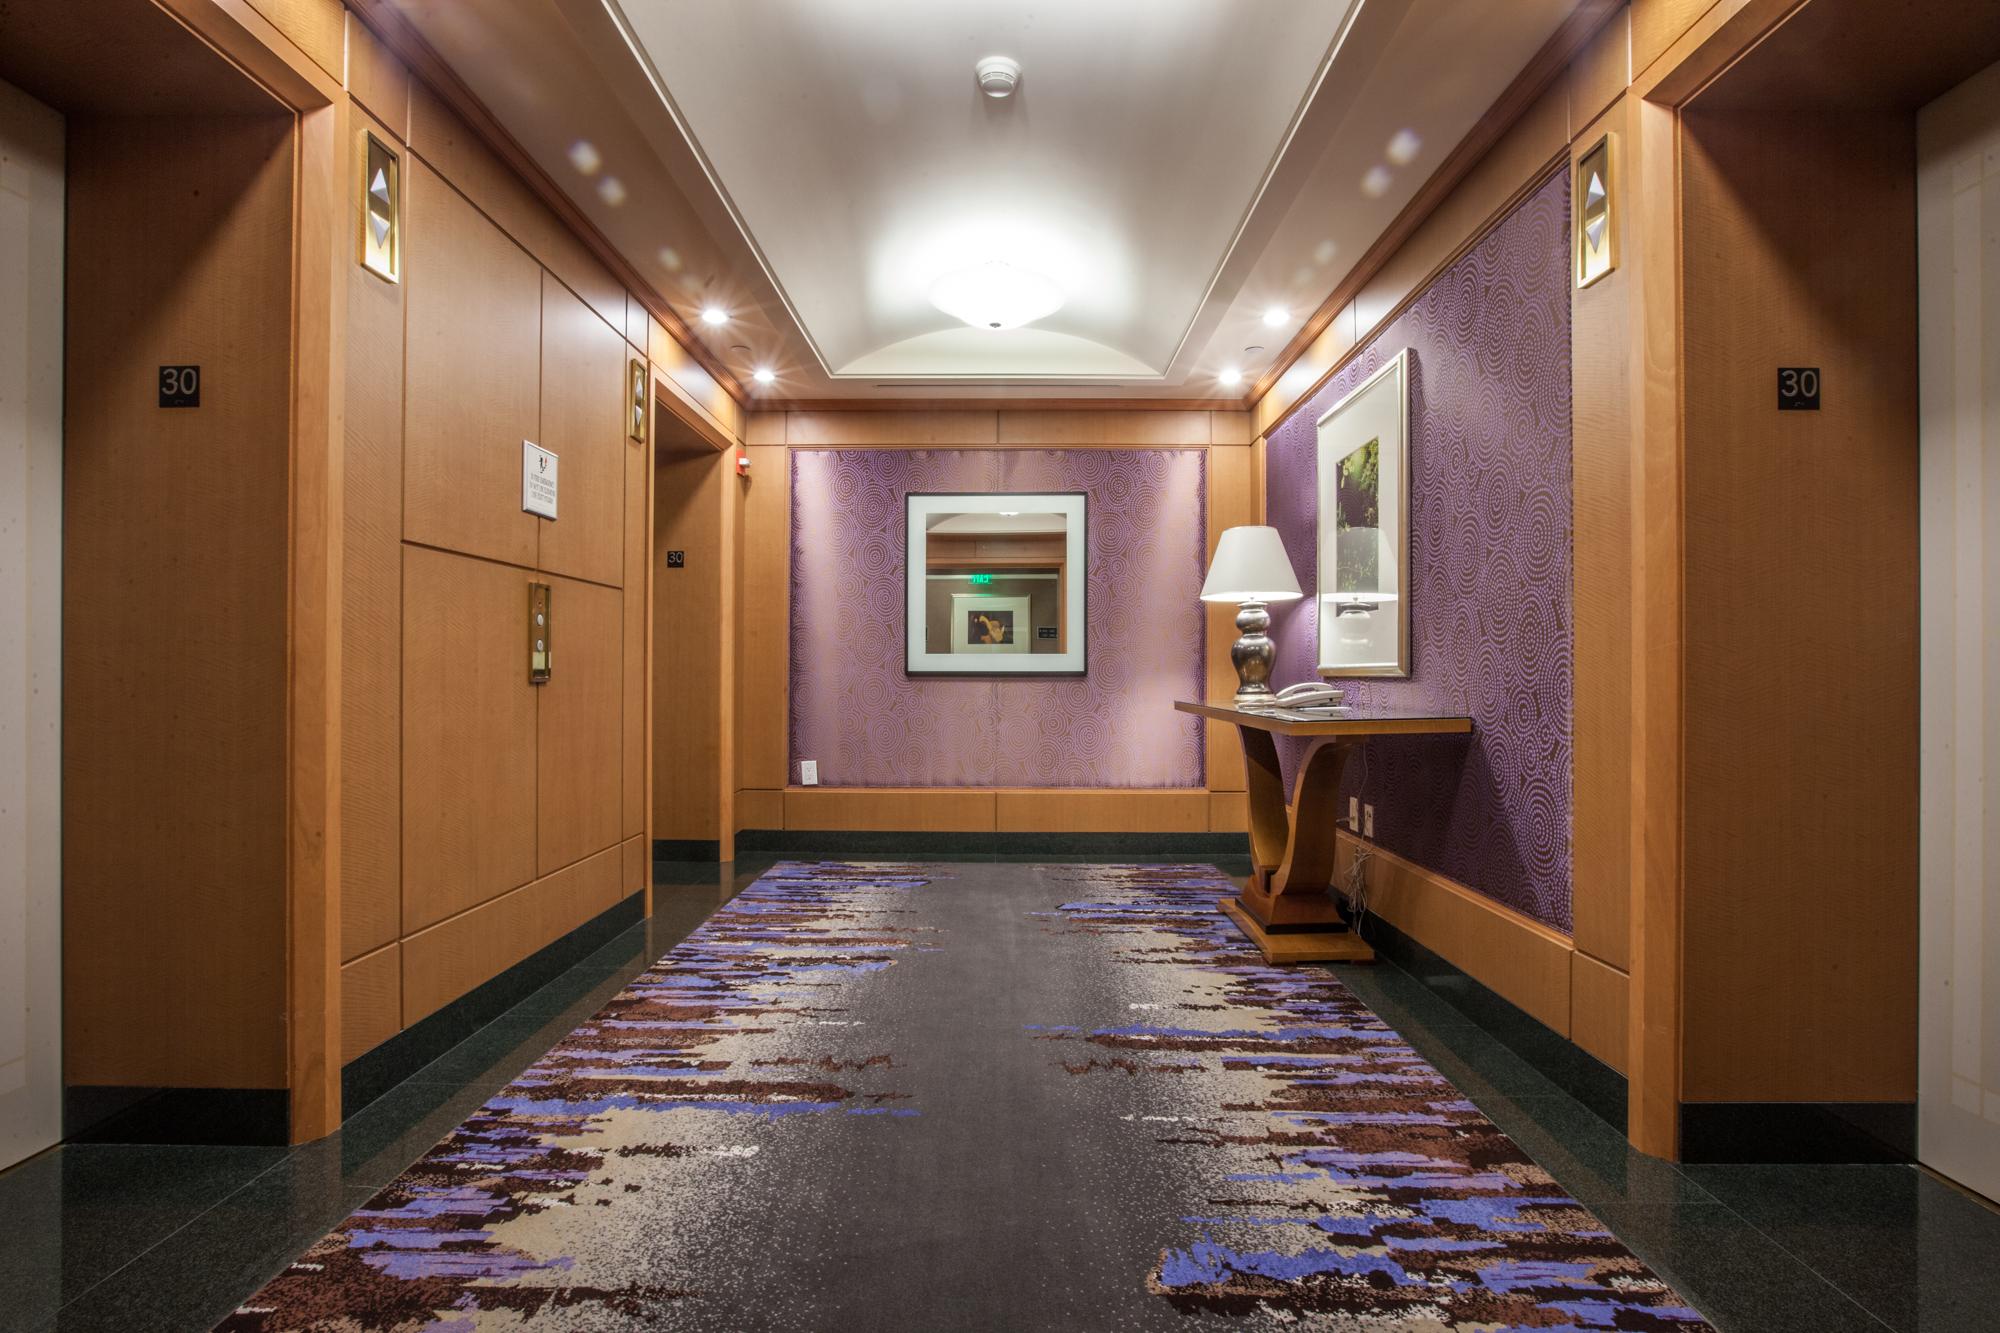 Four Seasons Brickell | Commercial Carpet Install in Miami FL